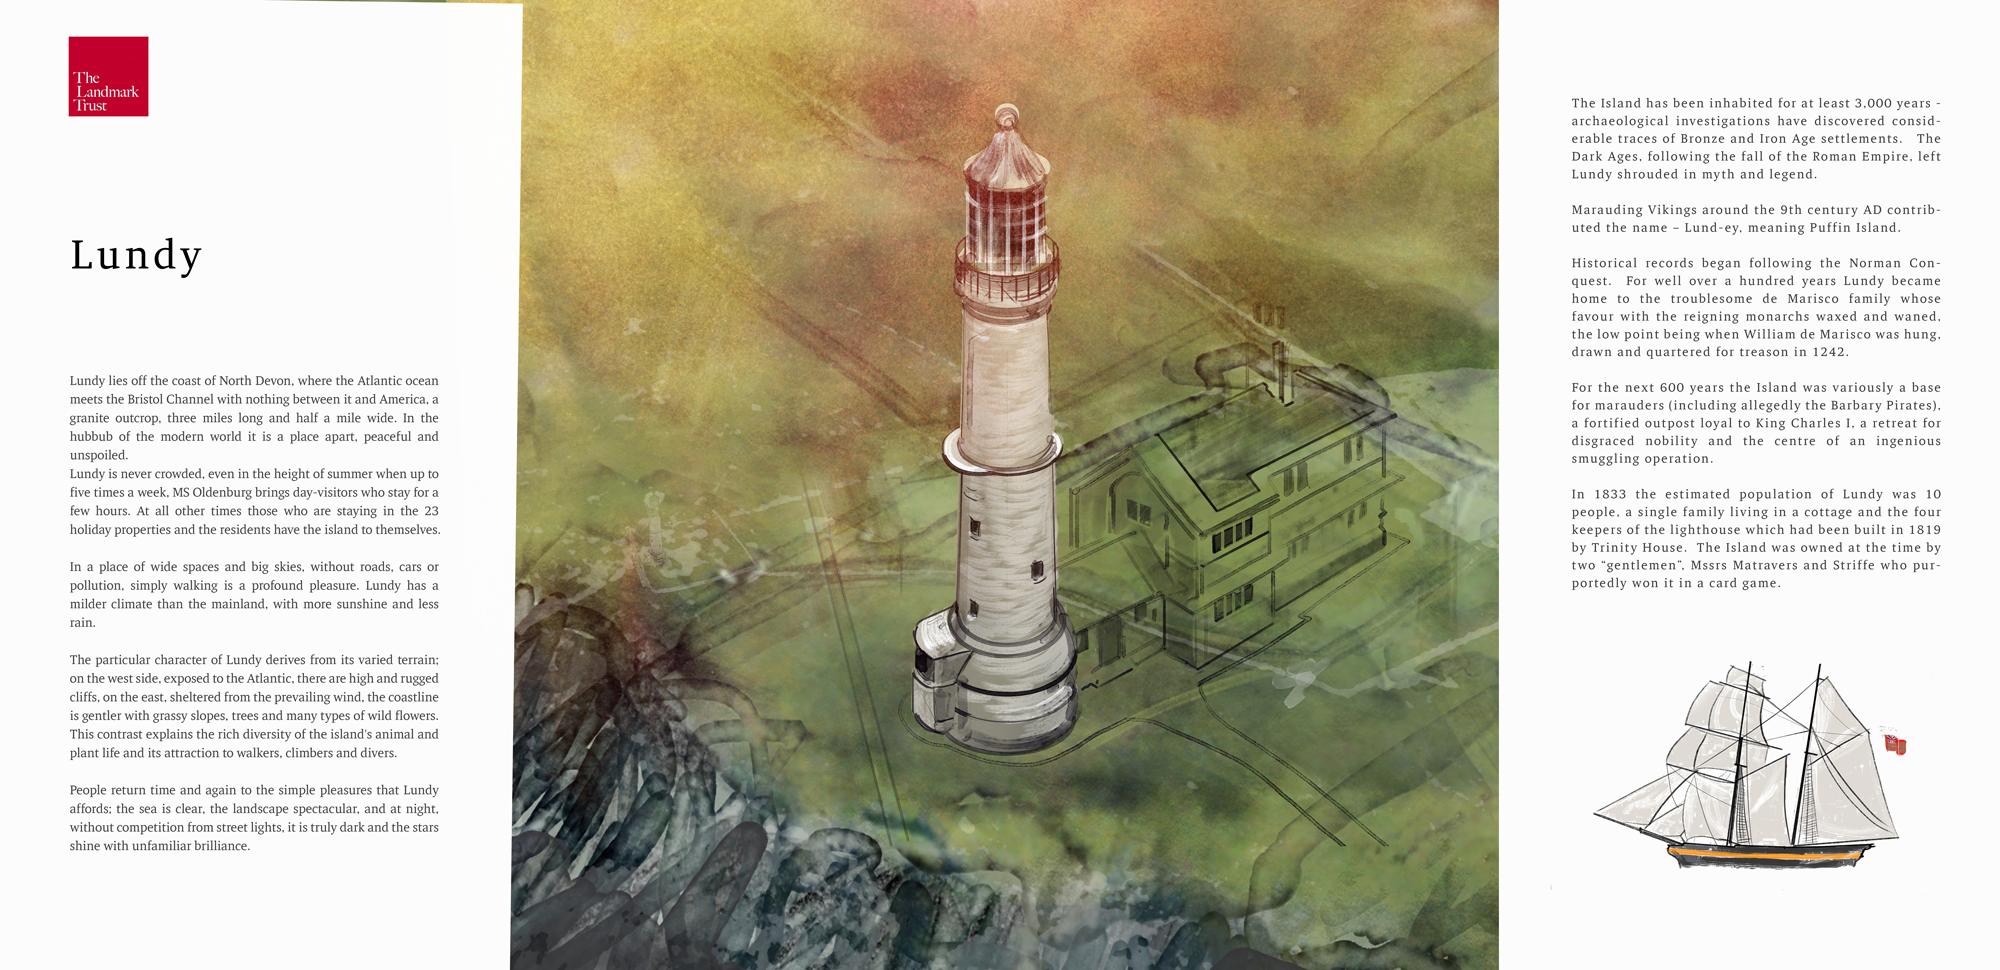 LANDMARK-illustration7v2.png